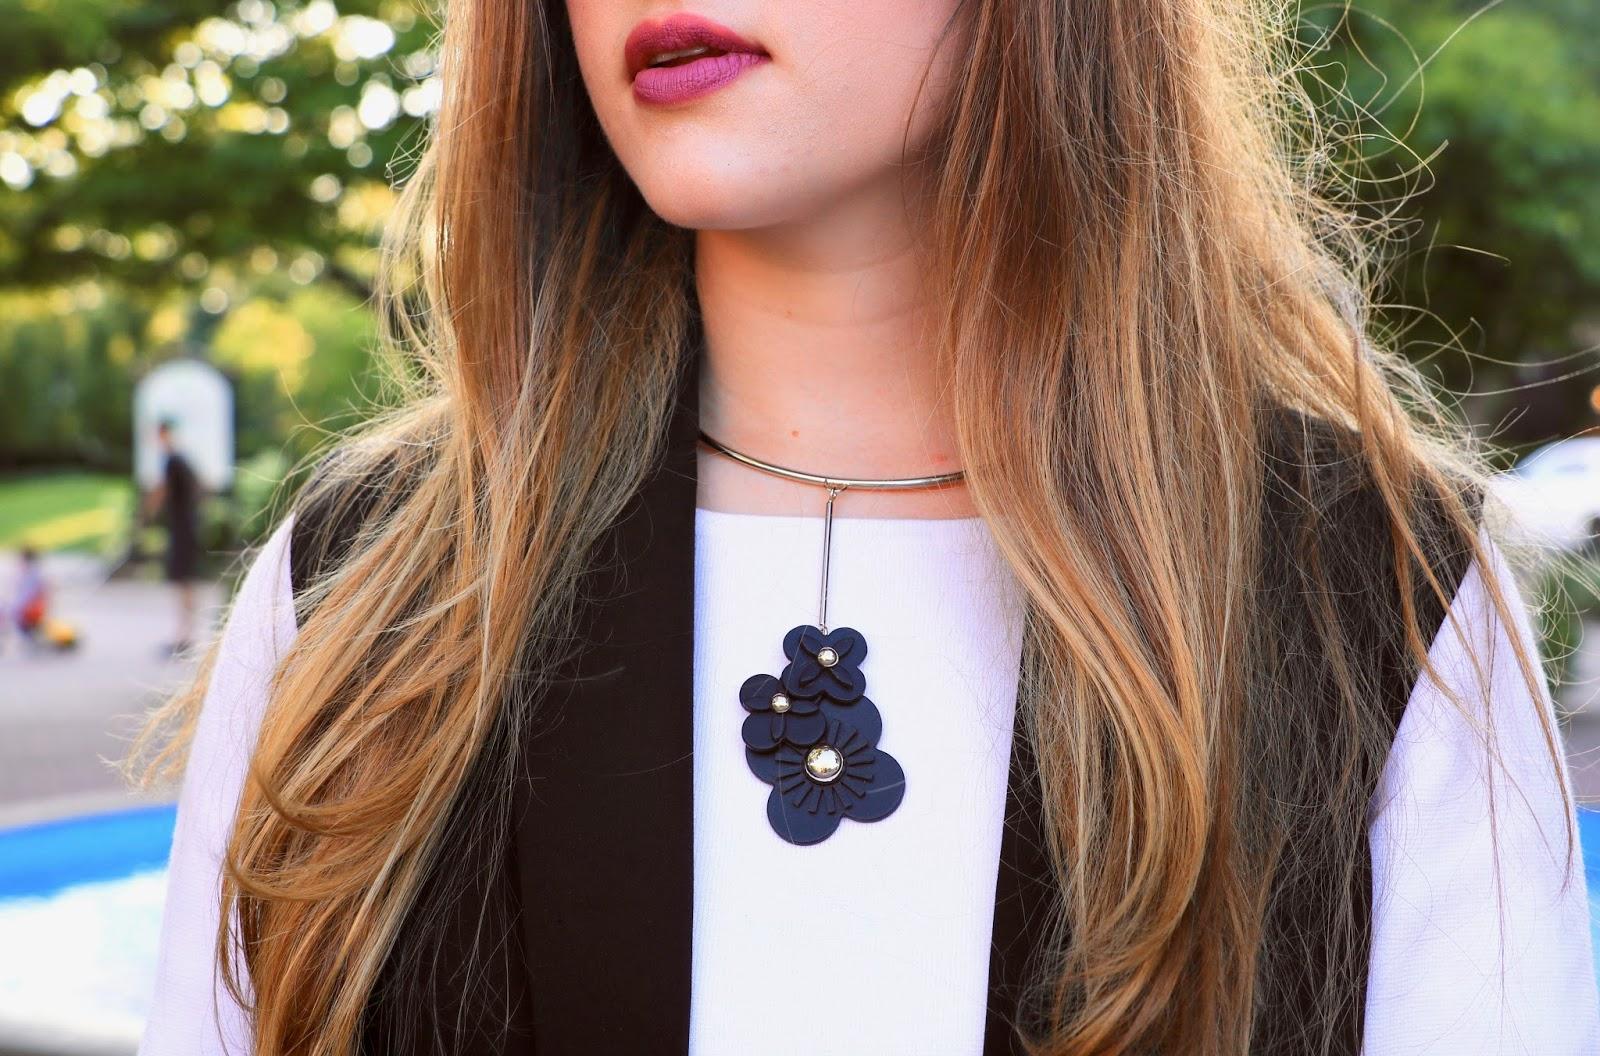 NYC fashion blogger Kathleen Harper of Kat's Fashion Fix wearing a silver flower choker